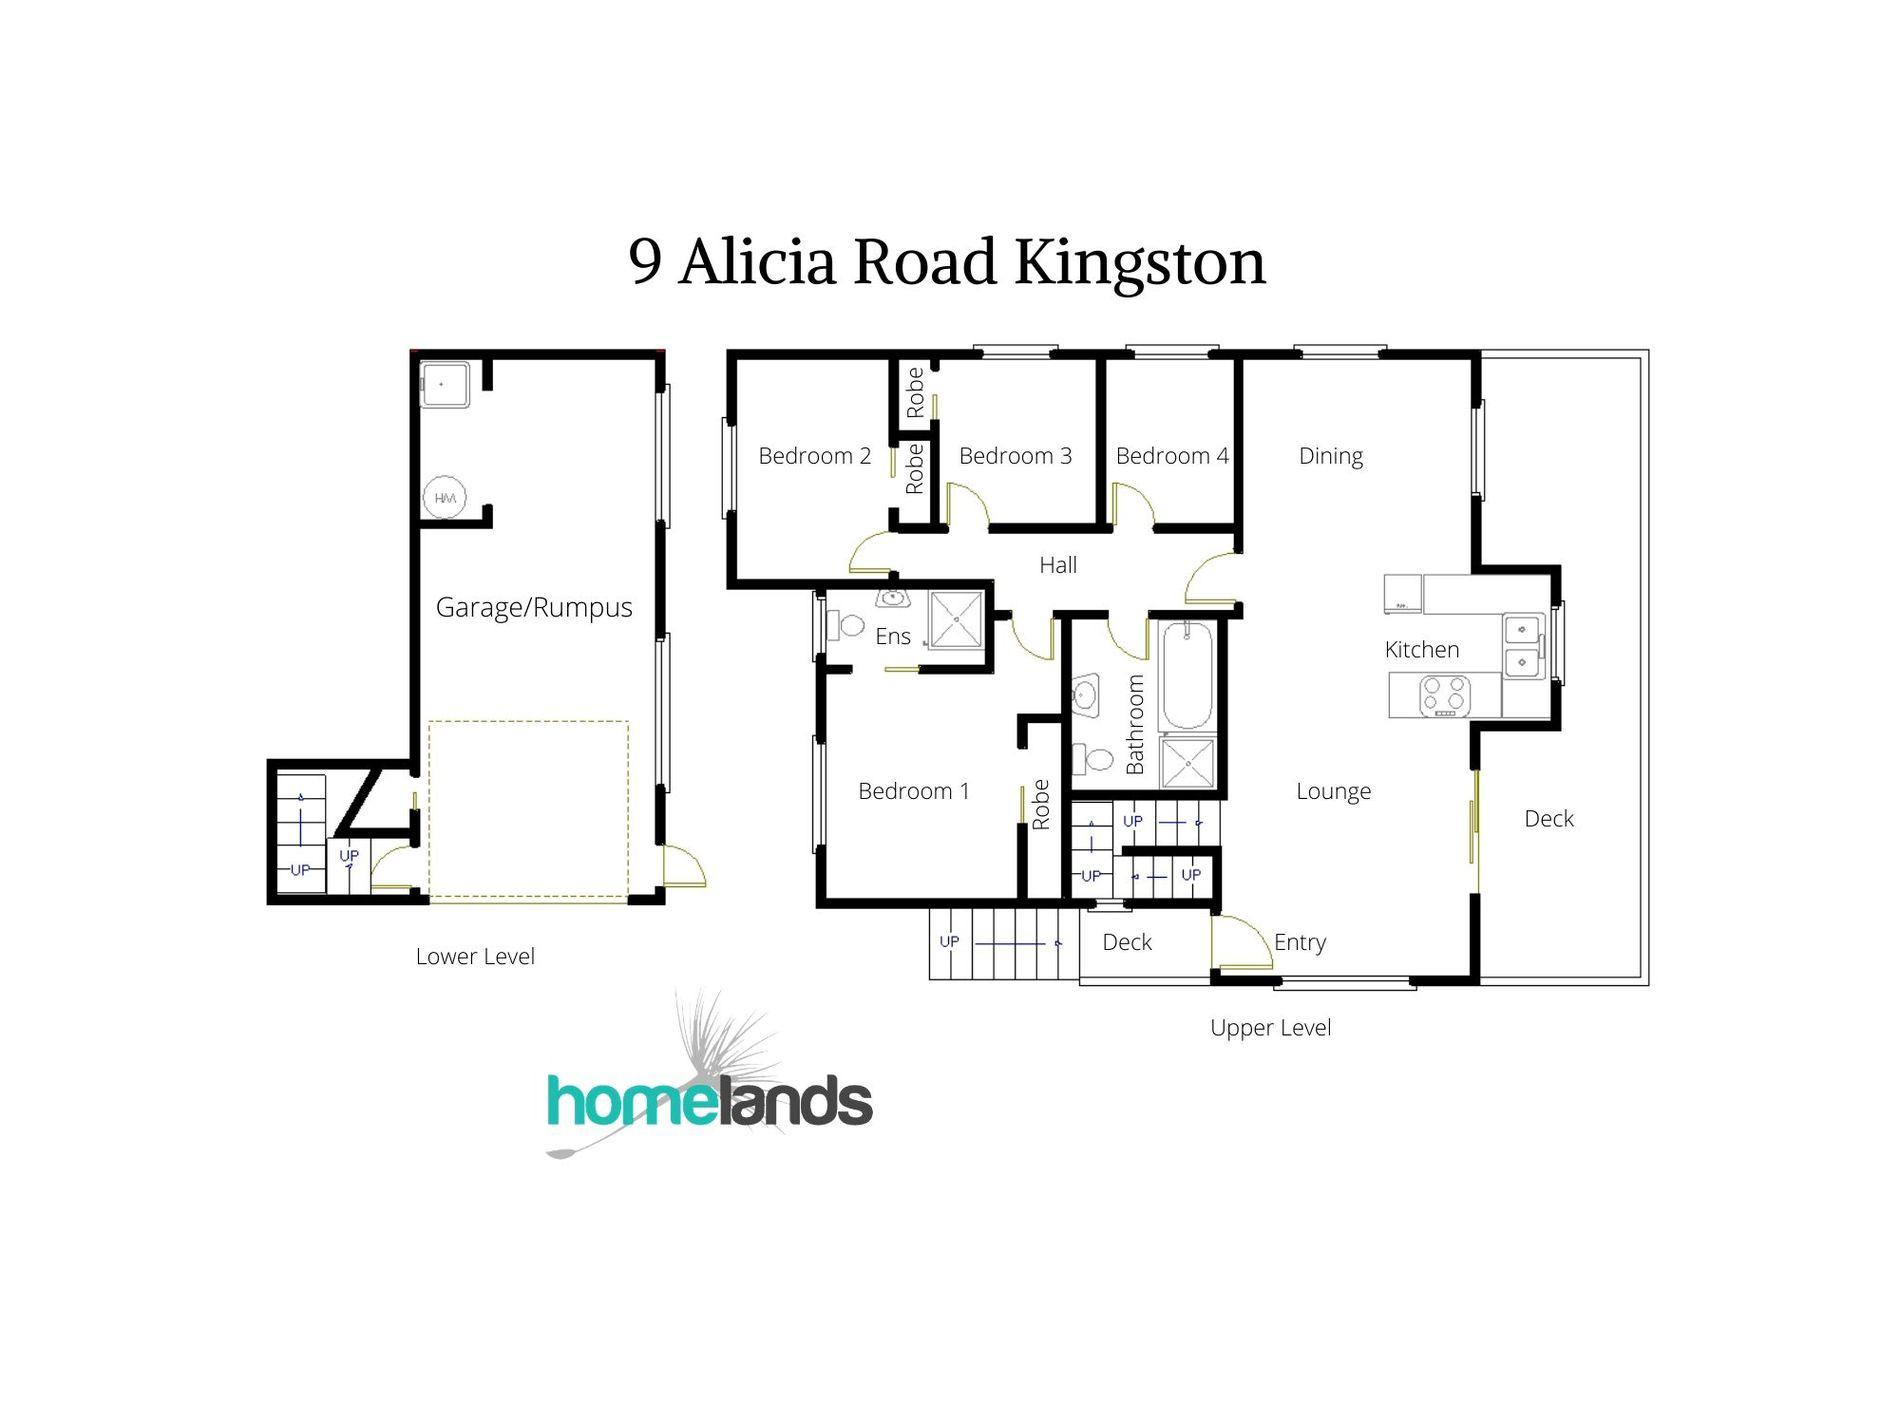 9 Alicia Road, Kingston